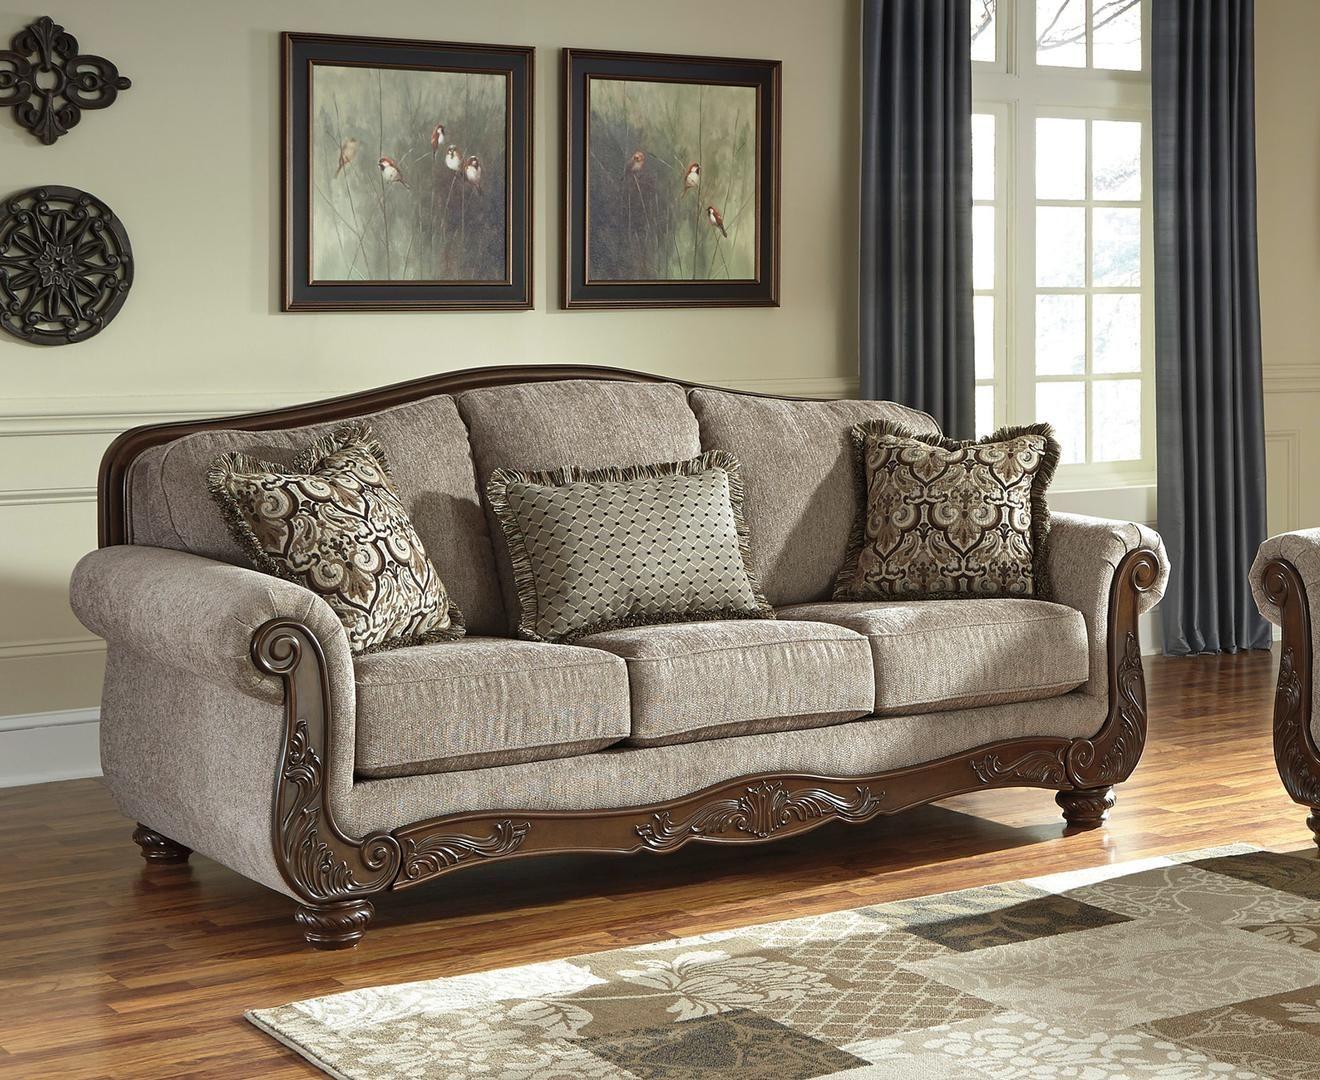 Signature Design by Ashley 5760338 Sofa, 60s furniture